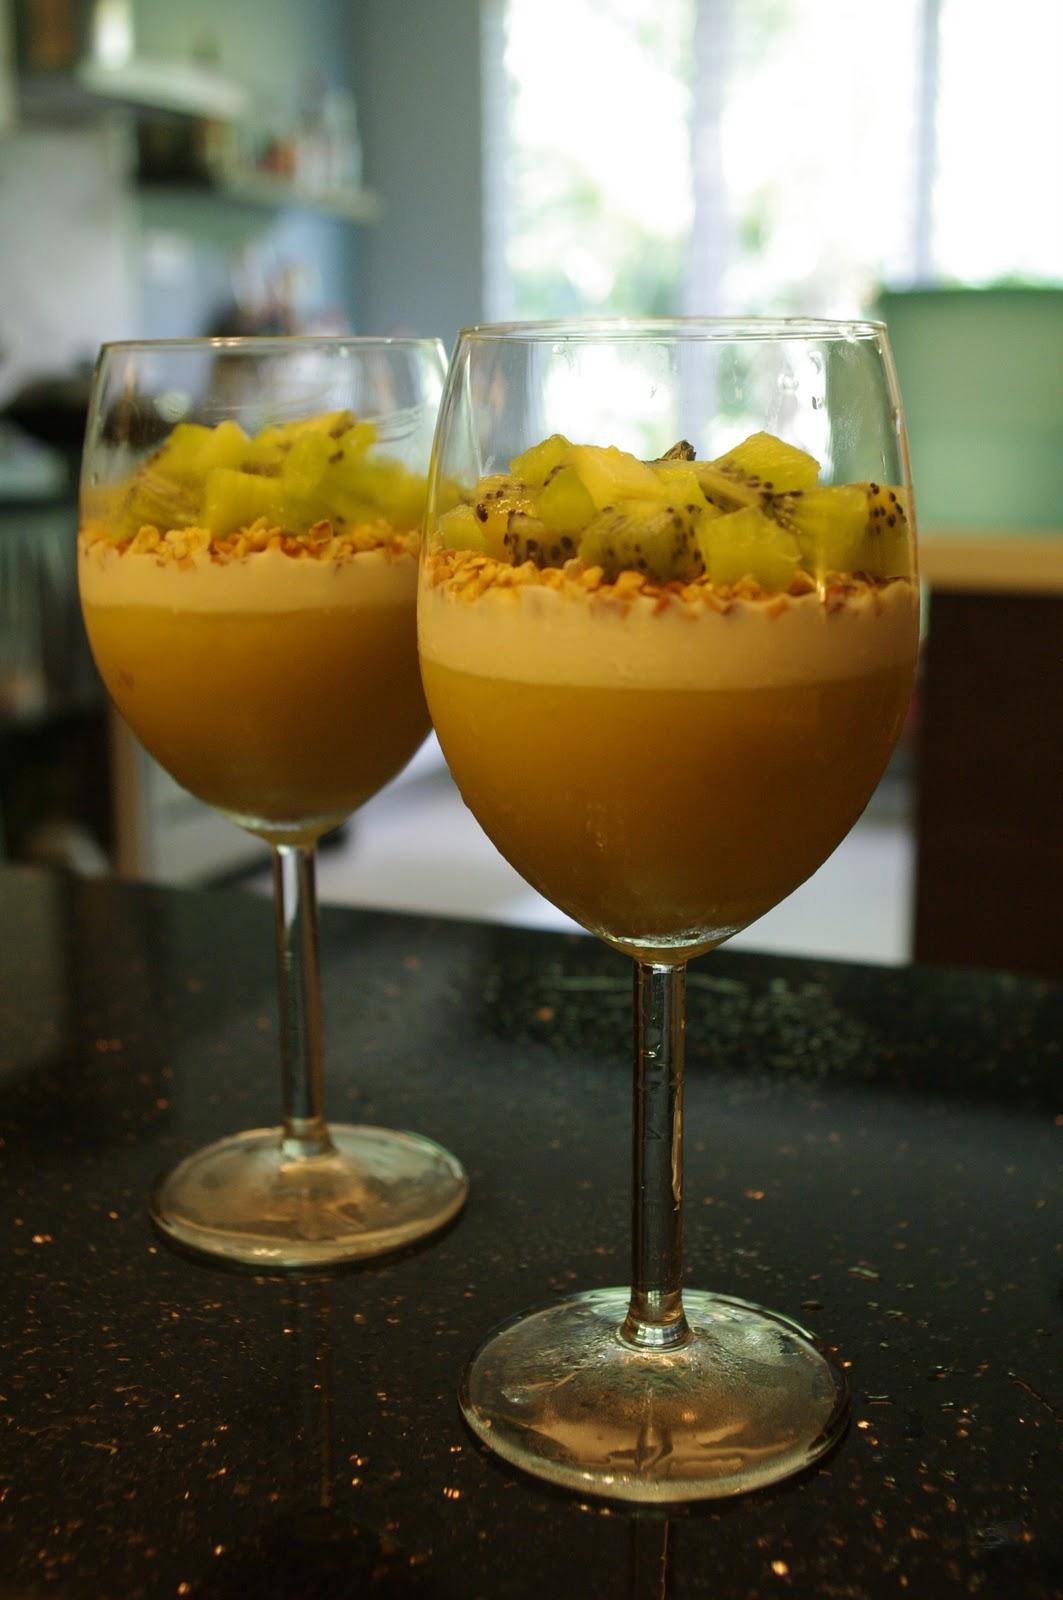 Top It Up With Yogurt, Nuts And Kiwi To Make It Into A Mango Parfait